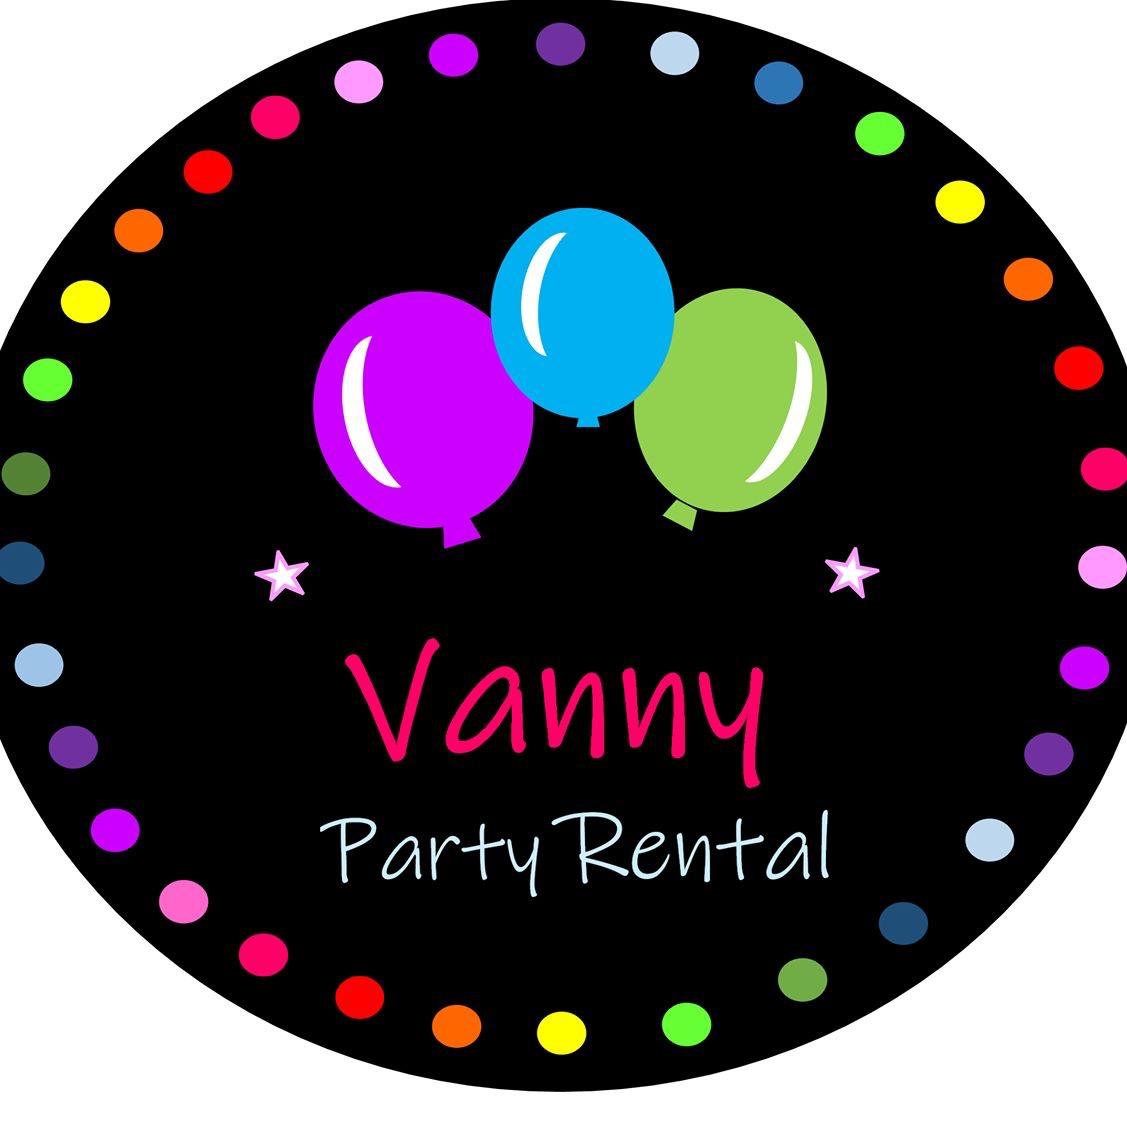 VANNY PARTY RENTAL primary image